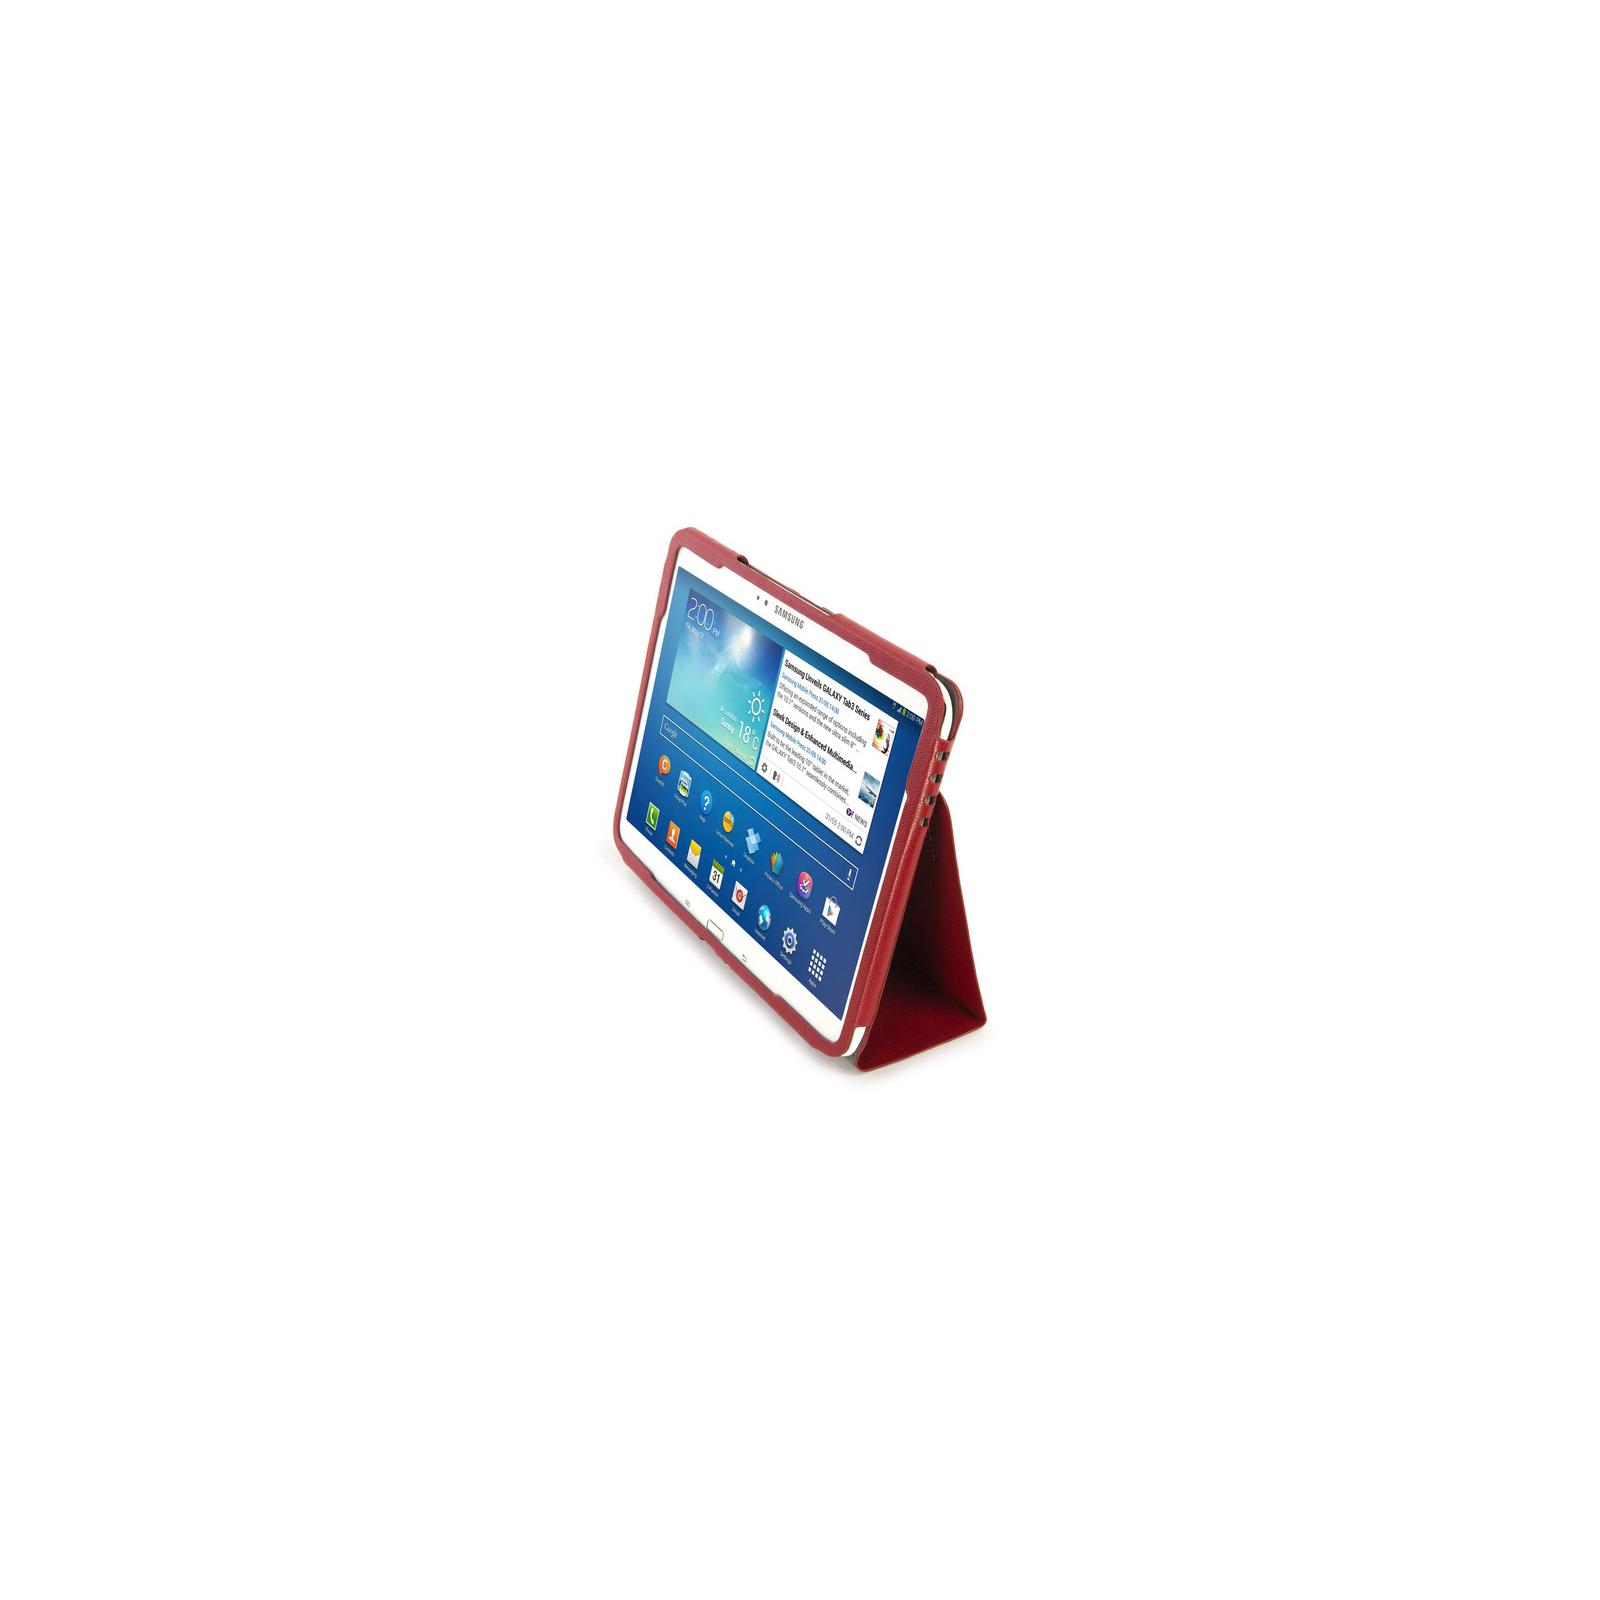 Чехол для планшета Tucano Galaxy Tab 3 10.1 Leggero Red (TAB-LS310-R) изображение 4